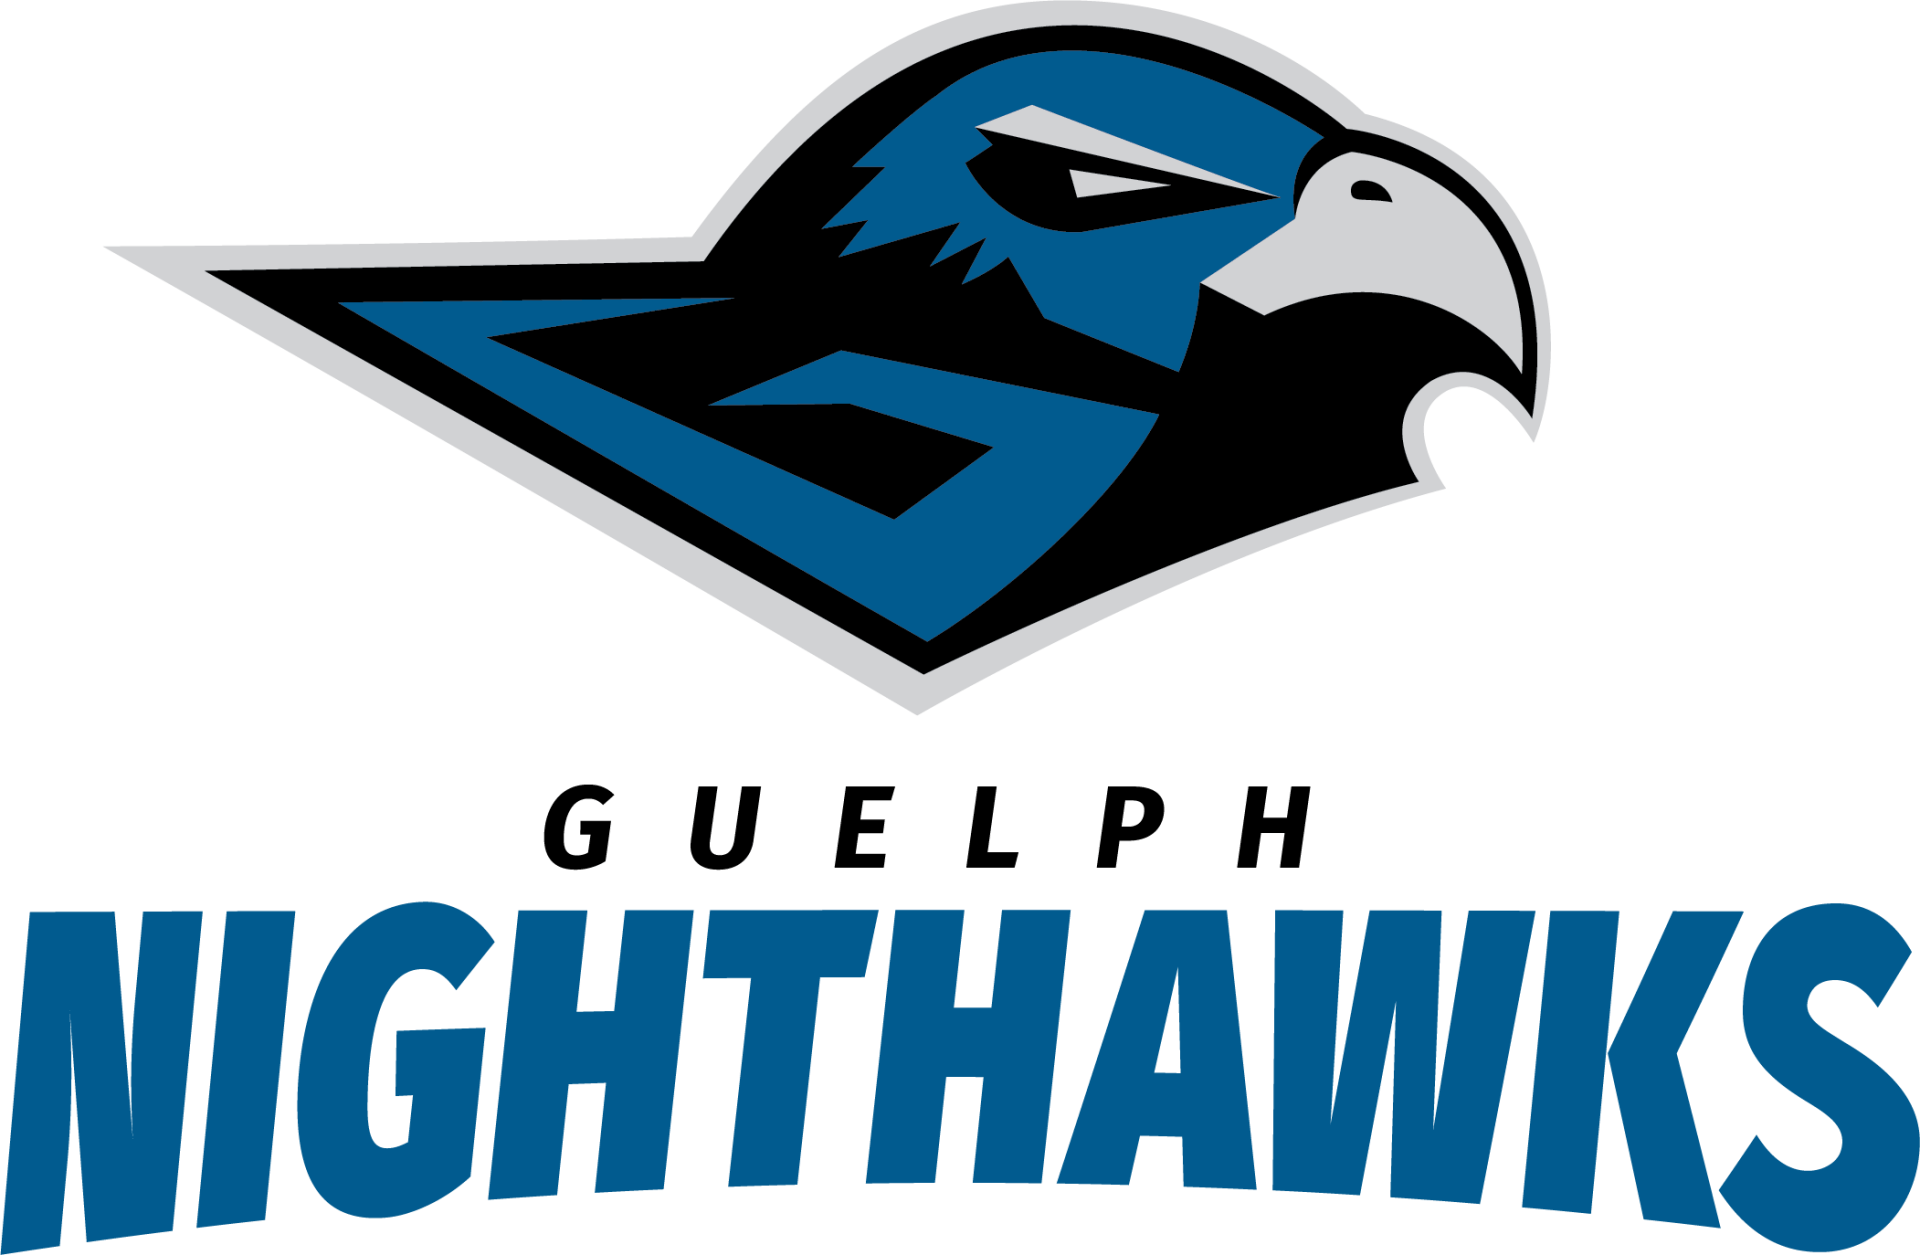 Guelph Nighthawks Canadian Professional Basketball Team